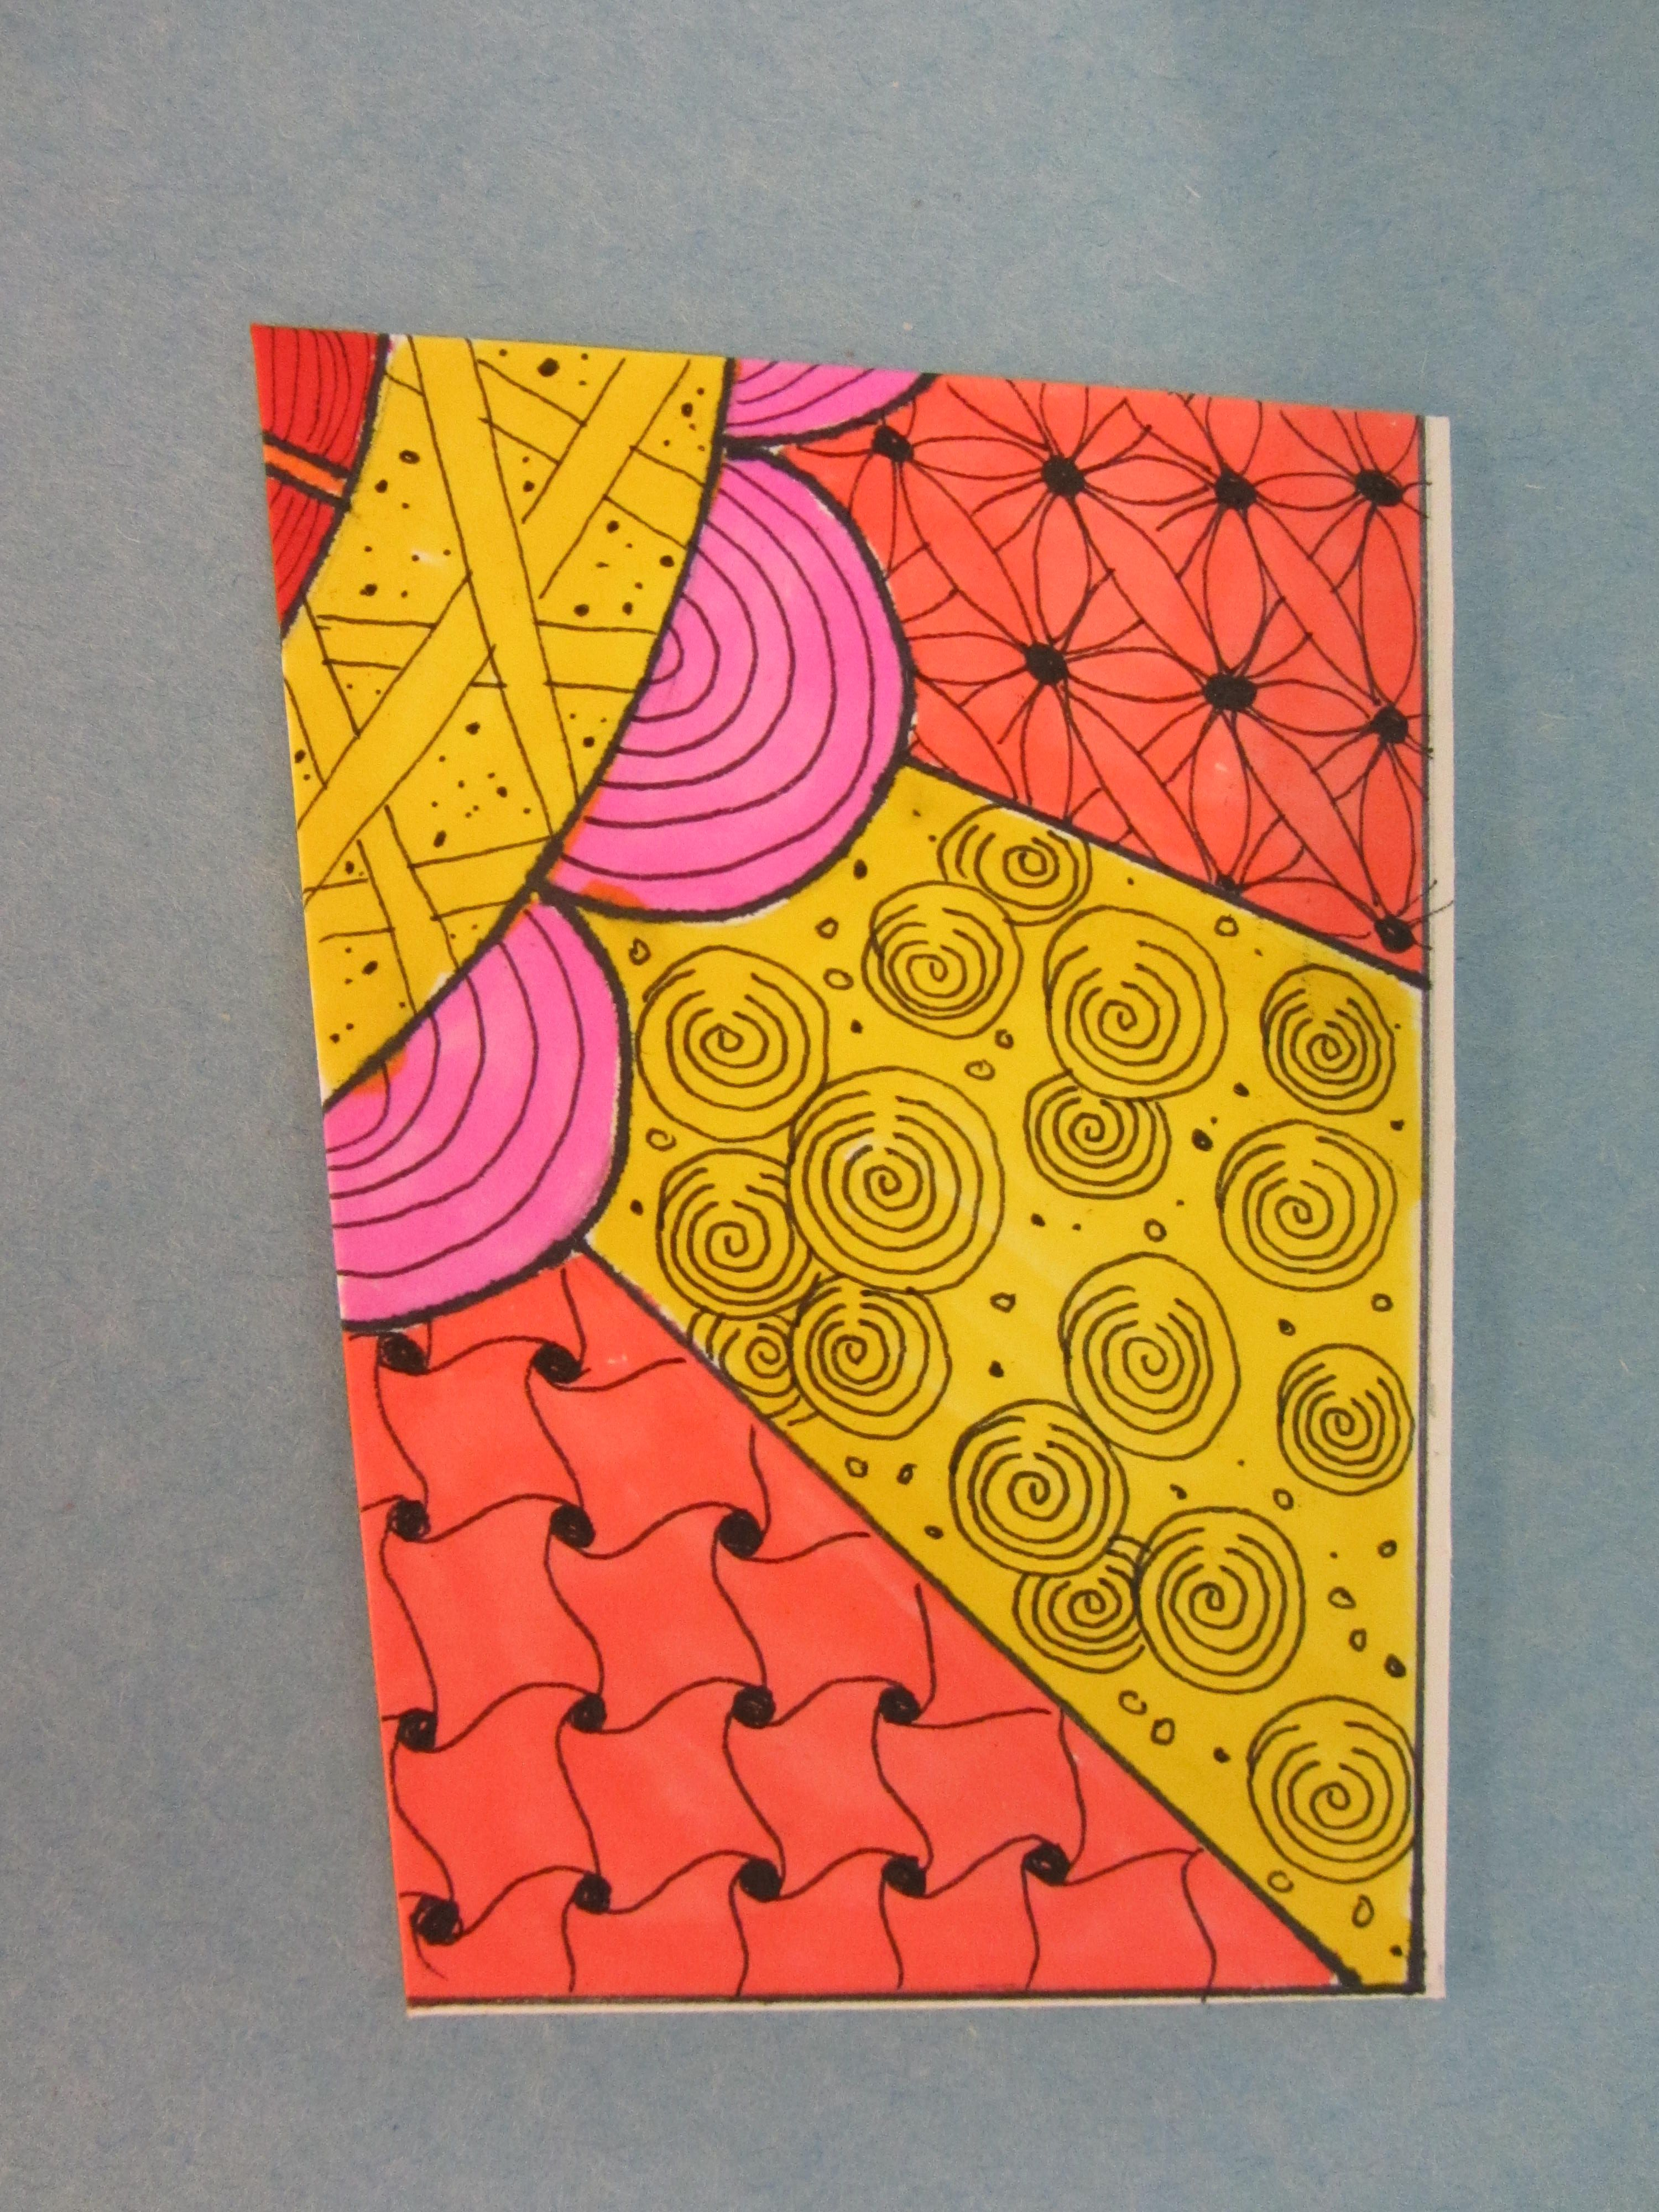 Zentangle puzzle piece by Nancy of Zen Drawing Club